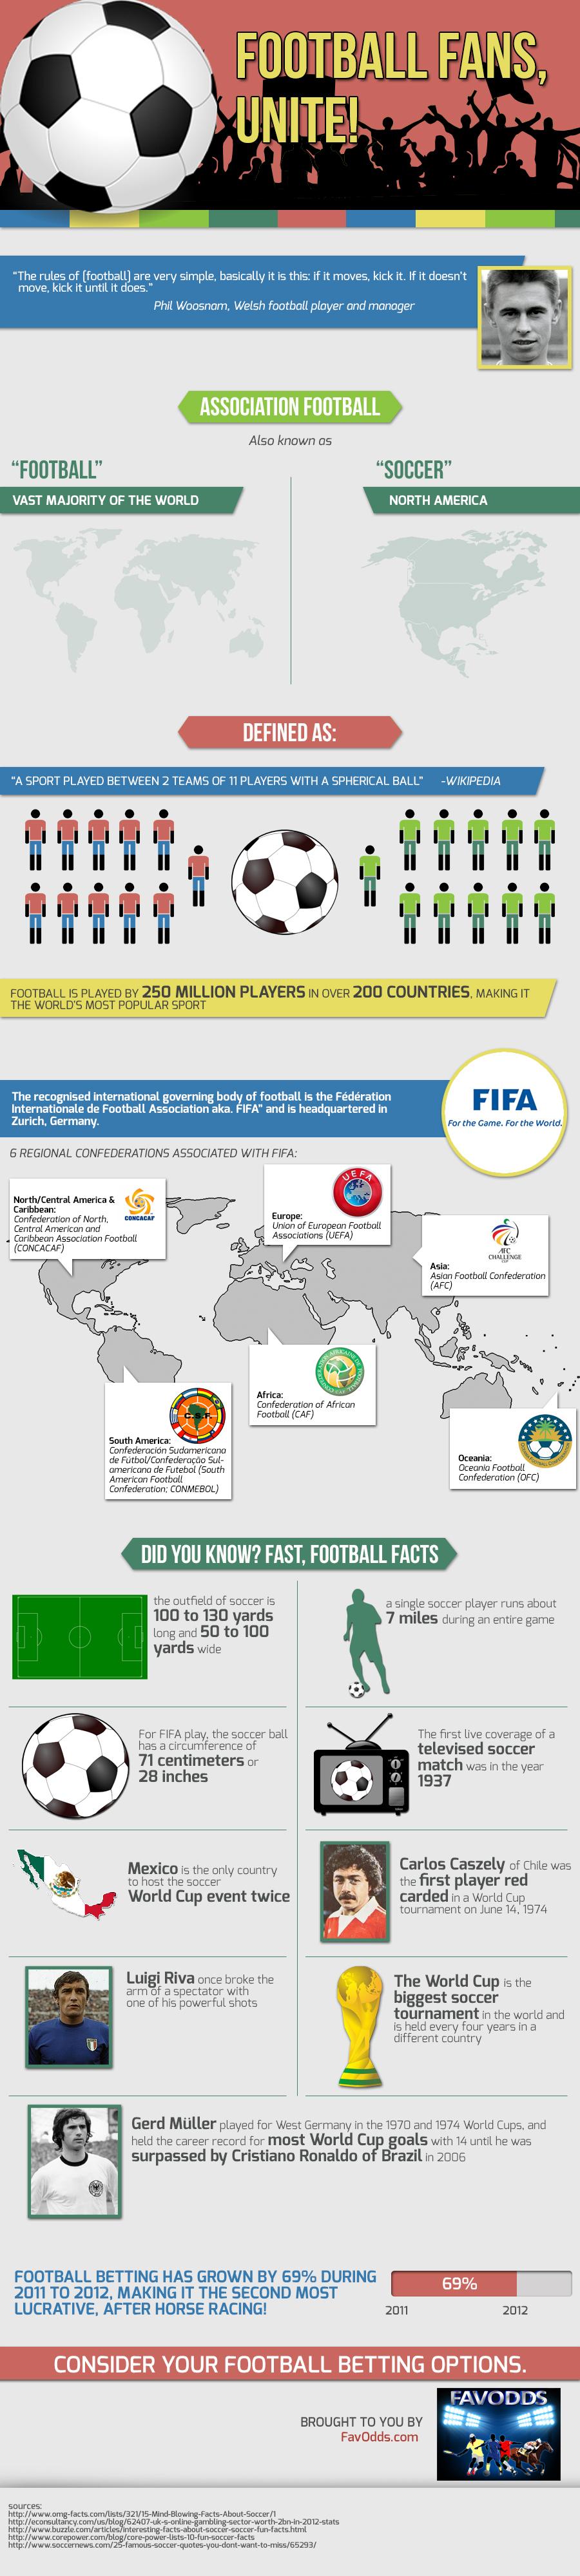 football-fans-unite_525a792530300